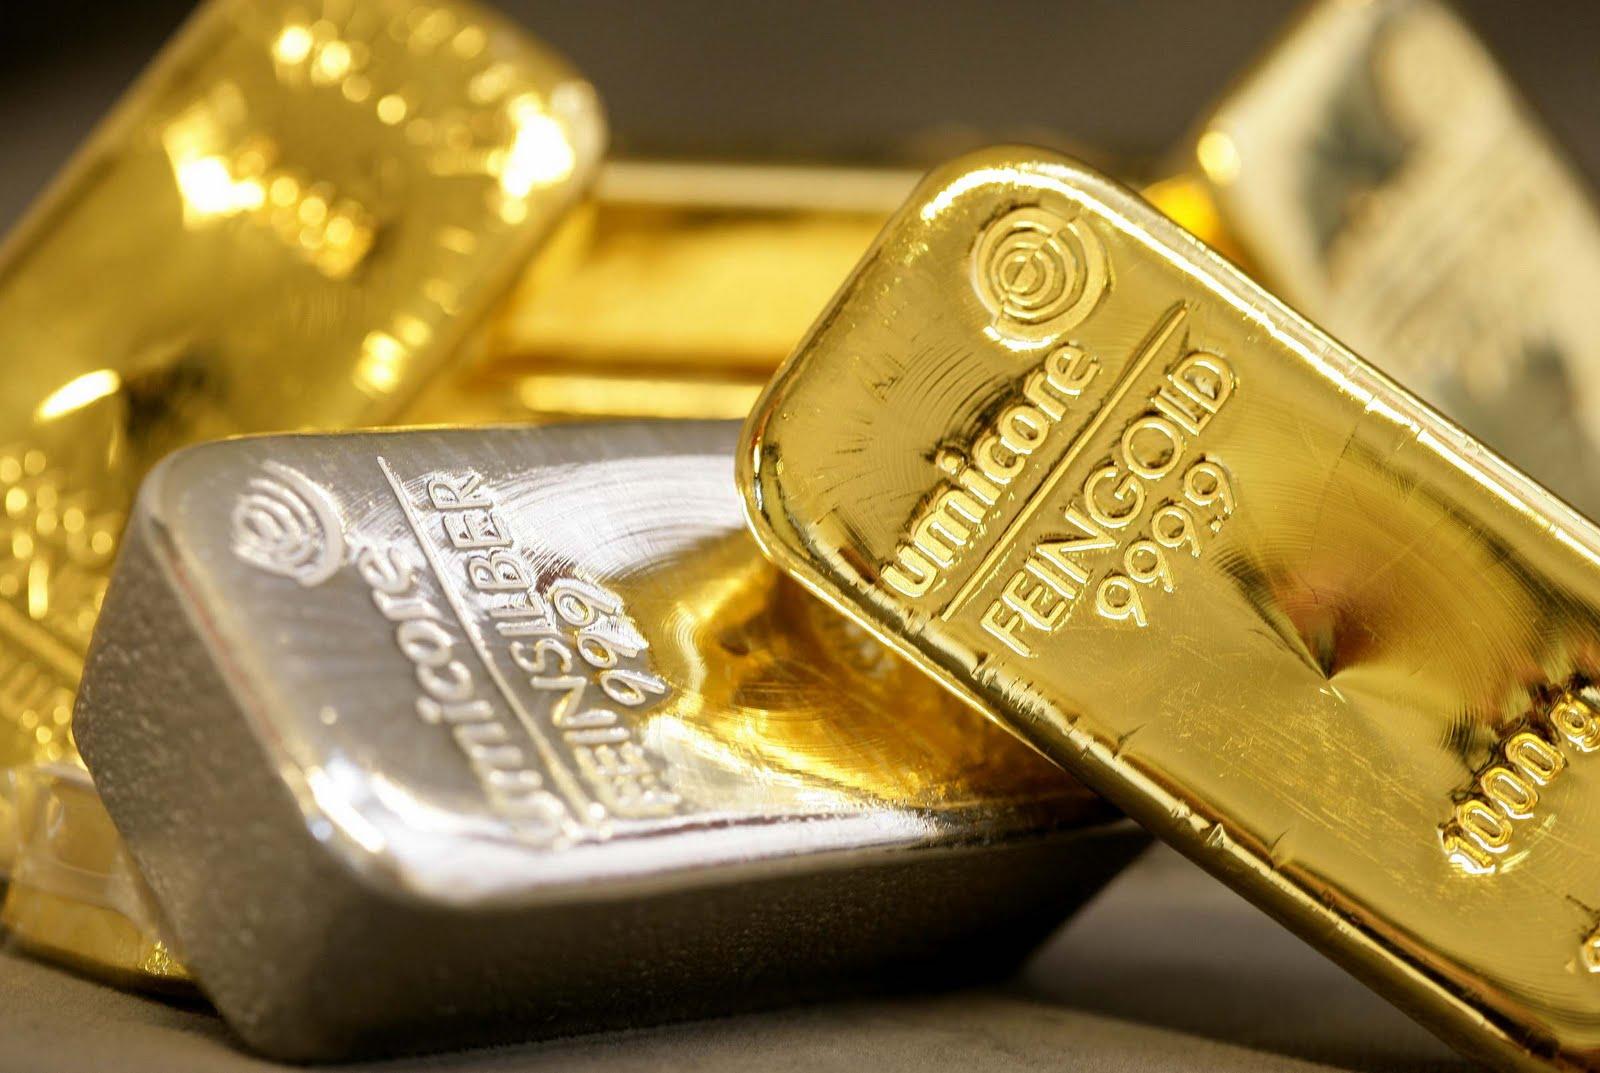 oro-e-argento_2013-10-28_15-44-59.jpeg